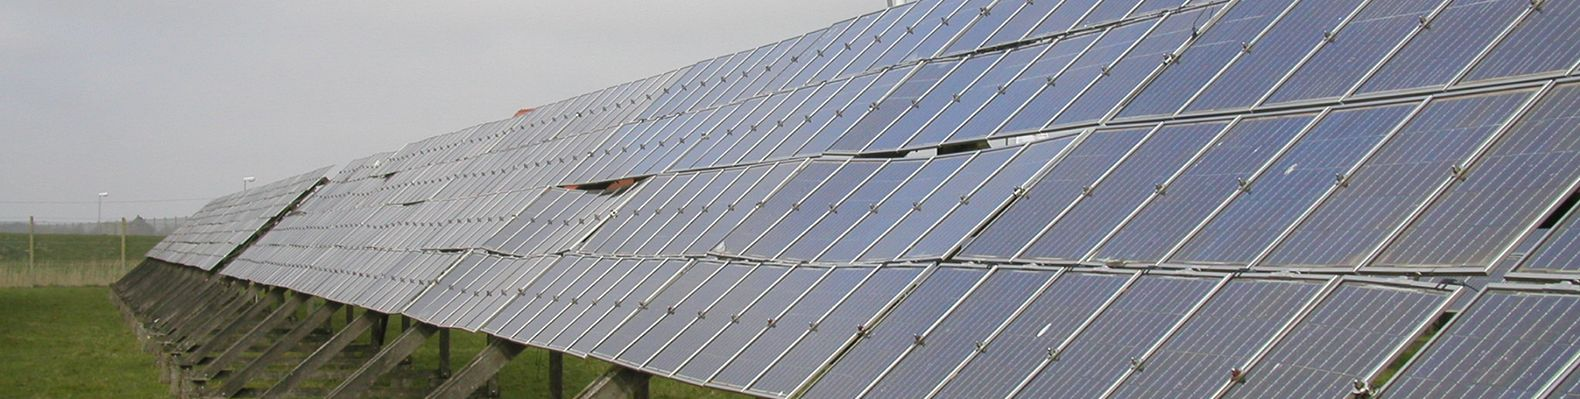 Solar Panel That Work From Rain